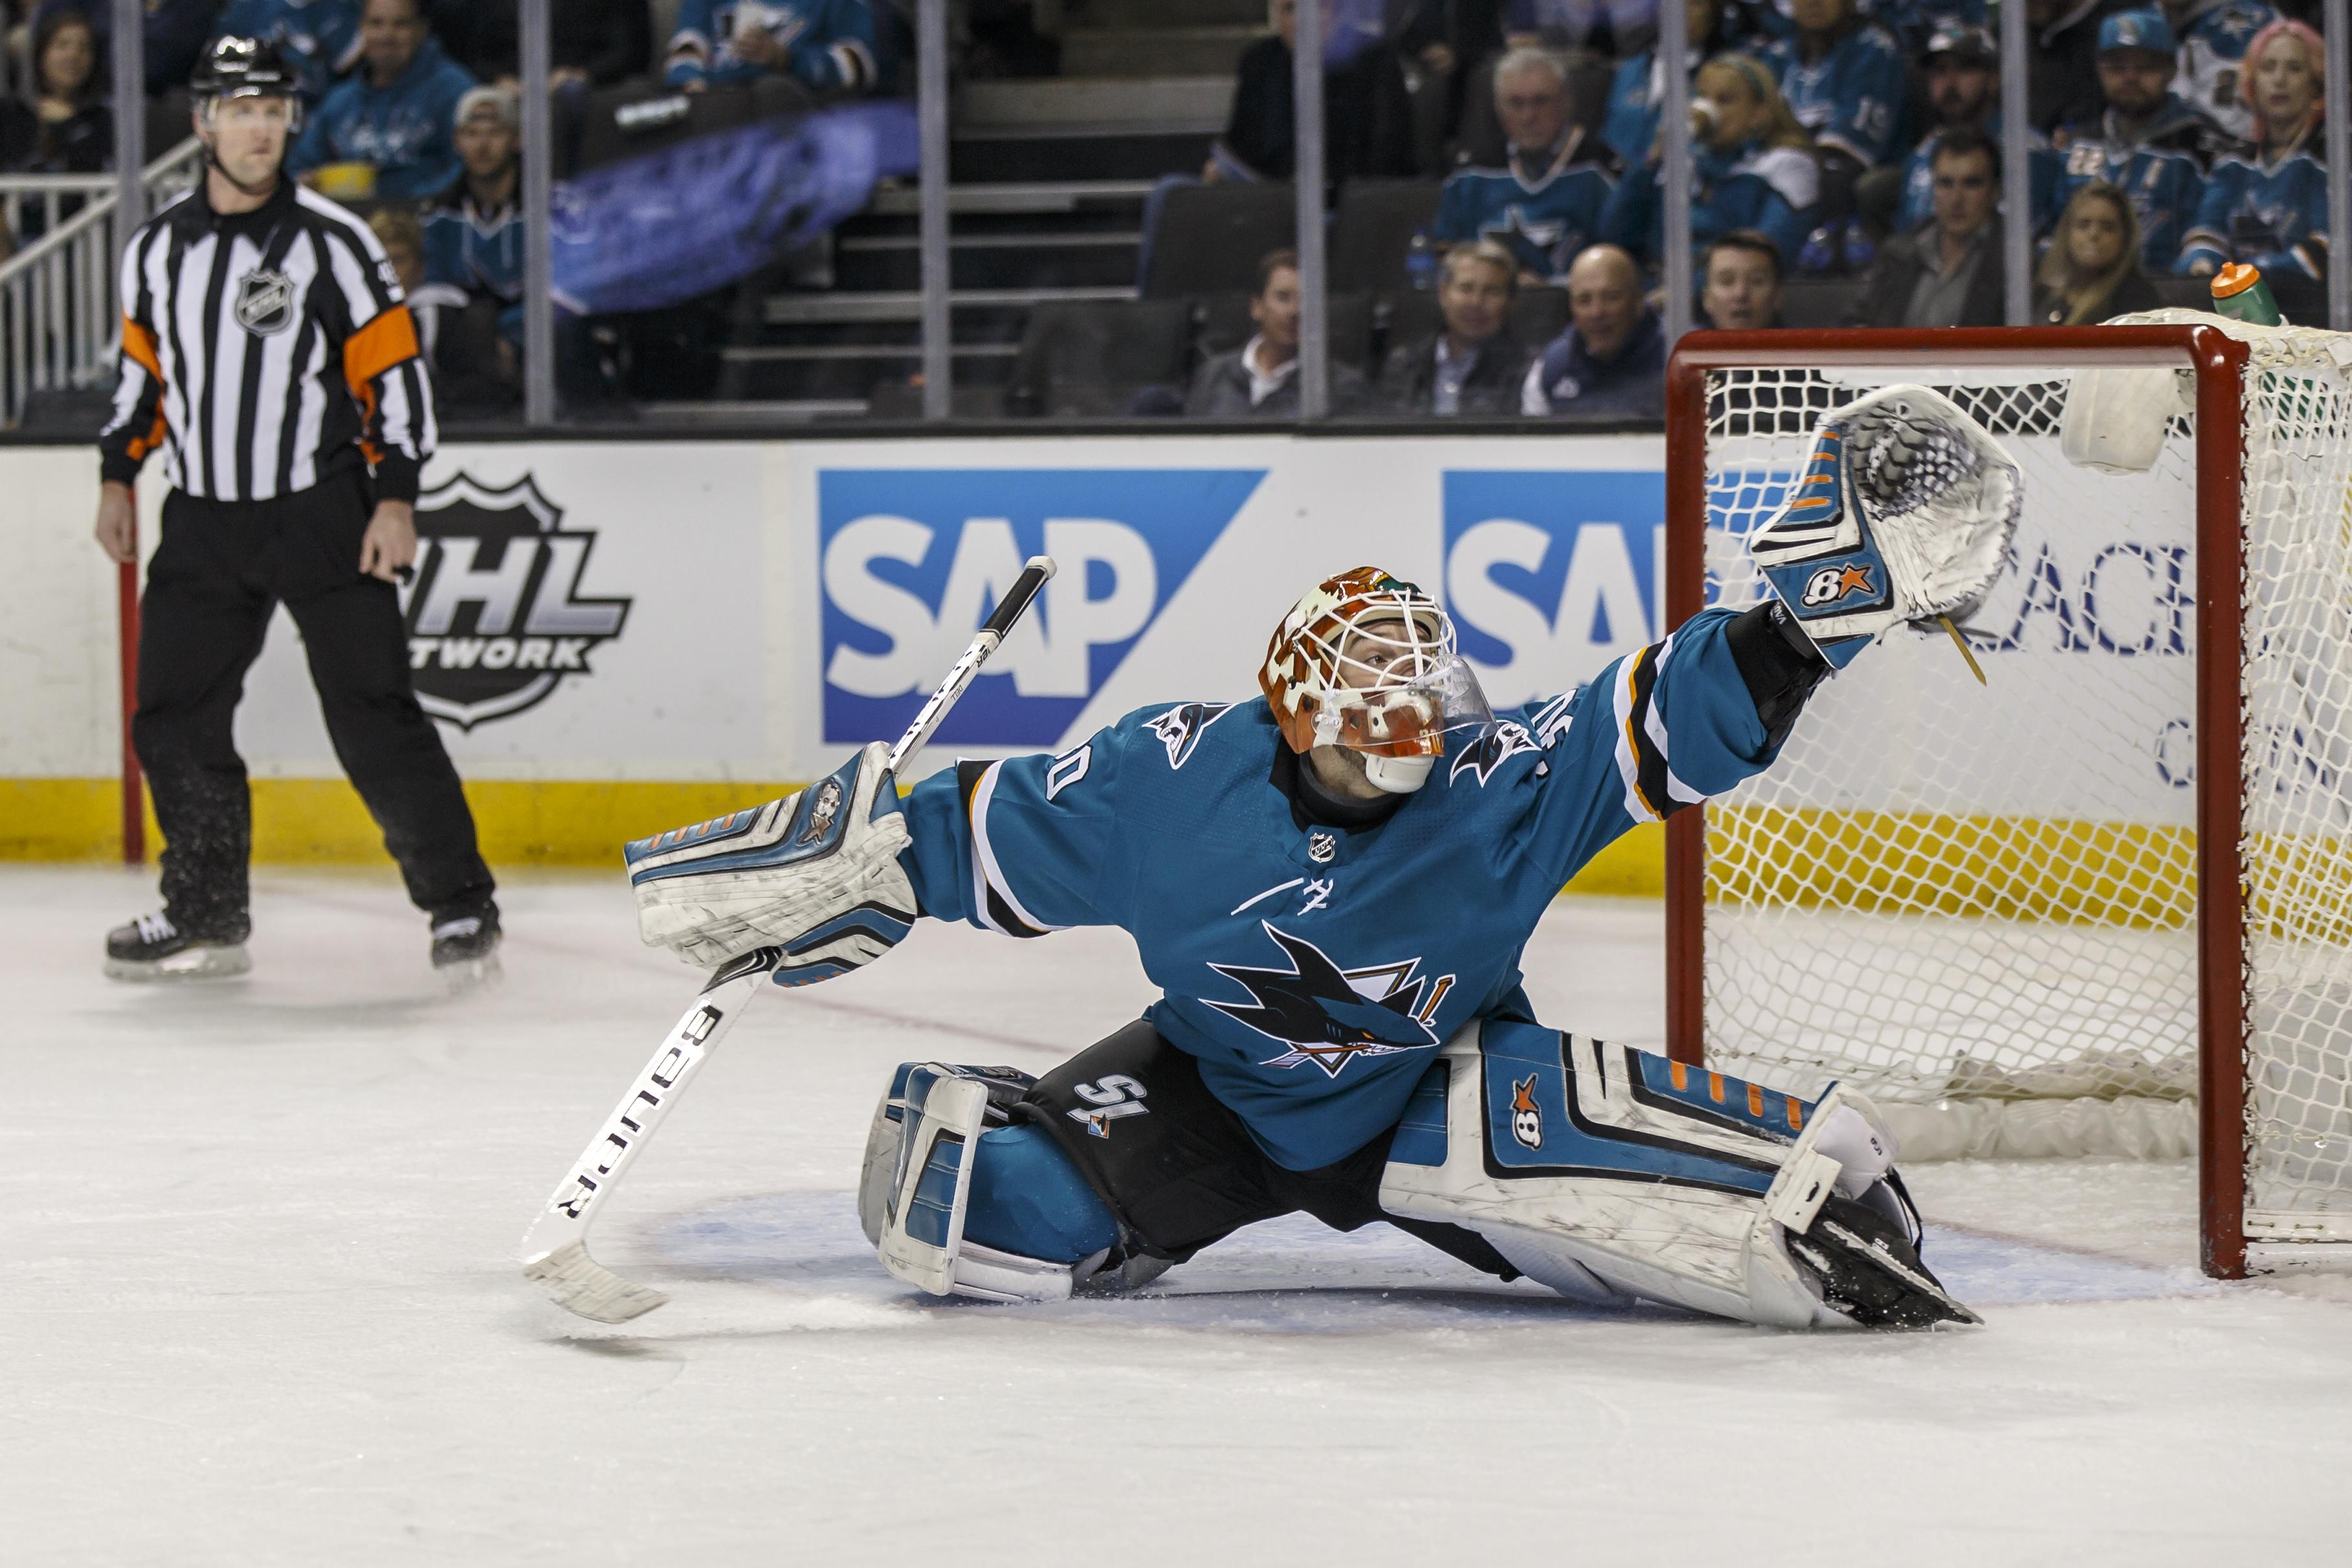 NHL: JAN 25 Rangers at Sharks